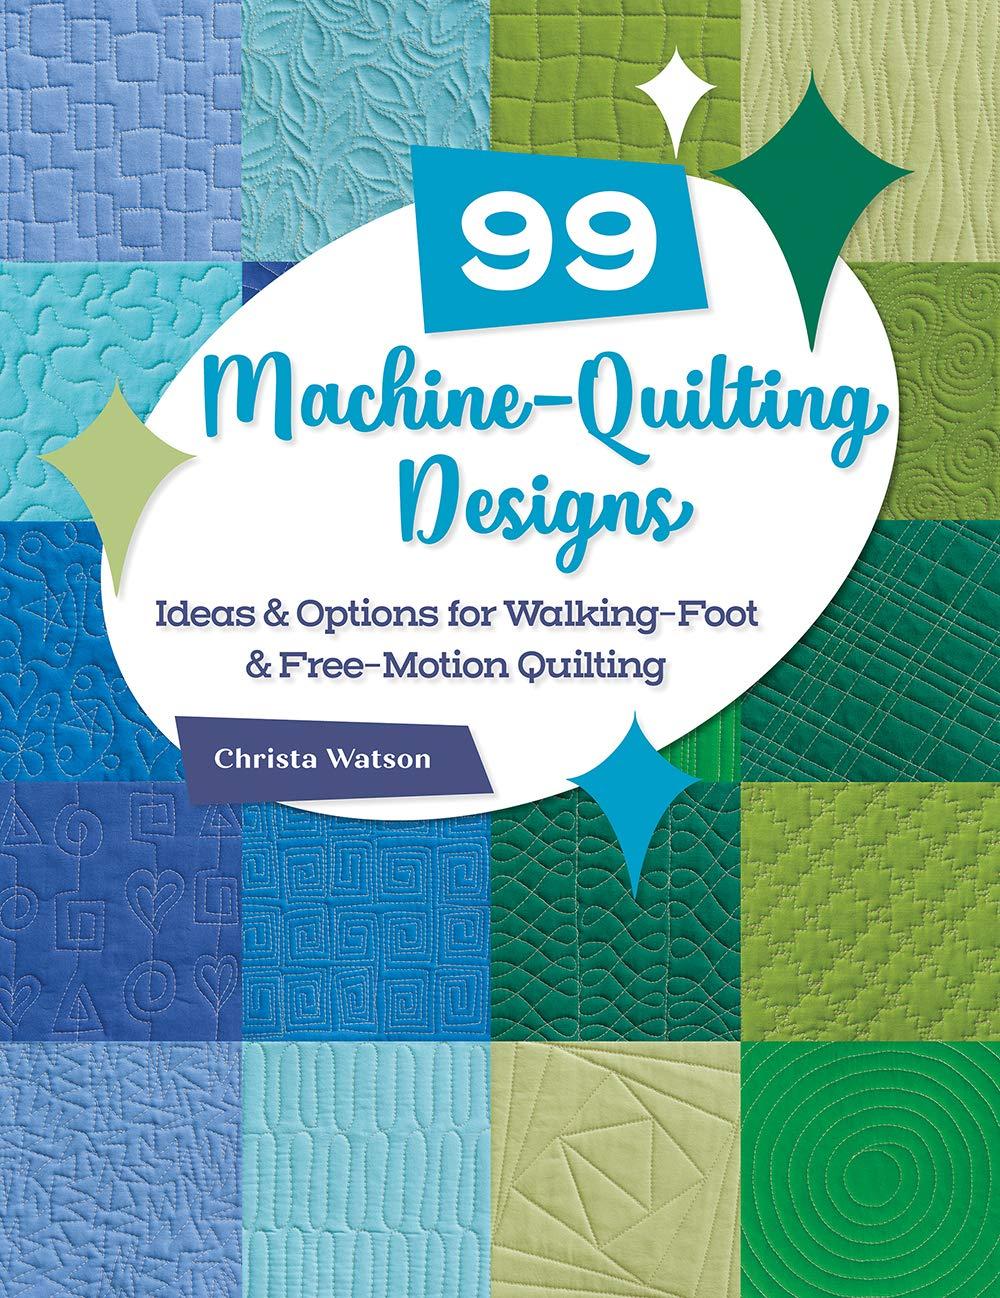 99 Machine-Quilting Designs Book